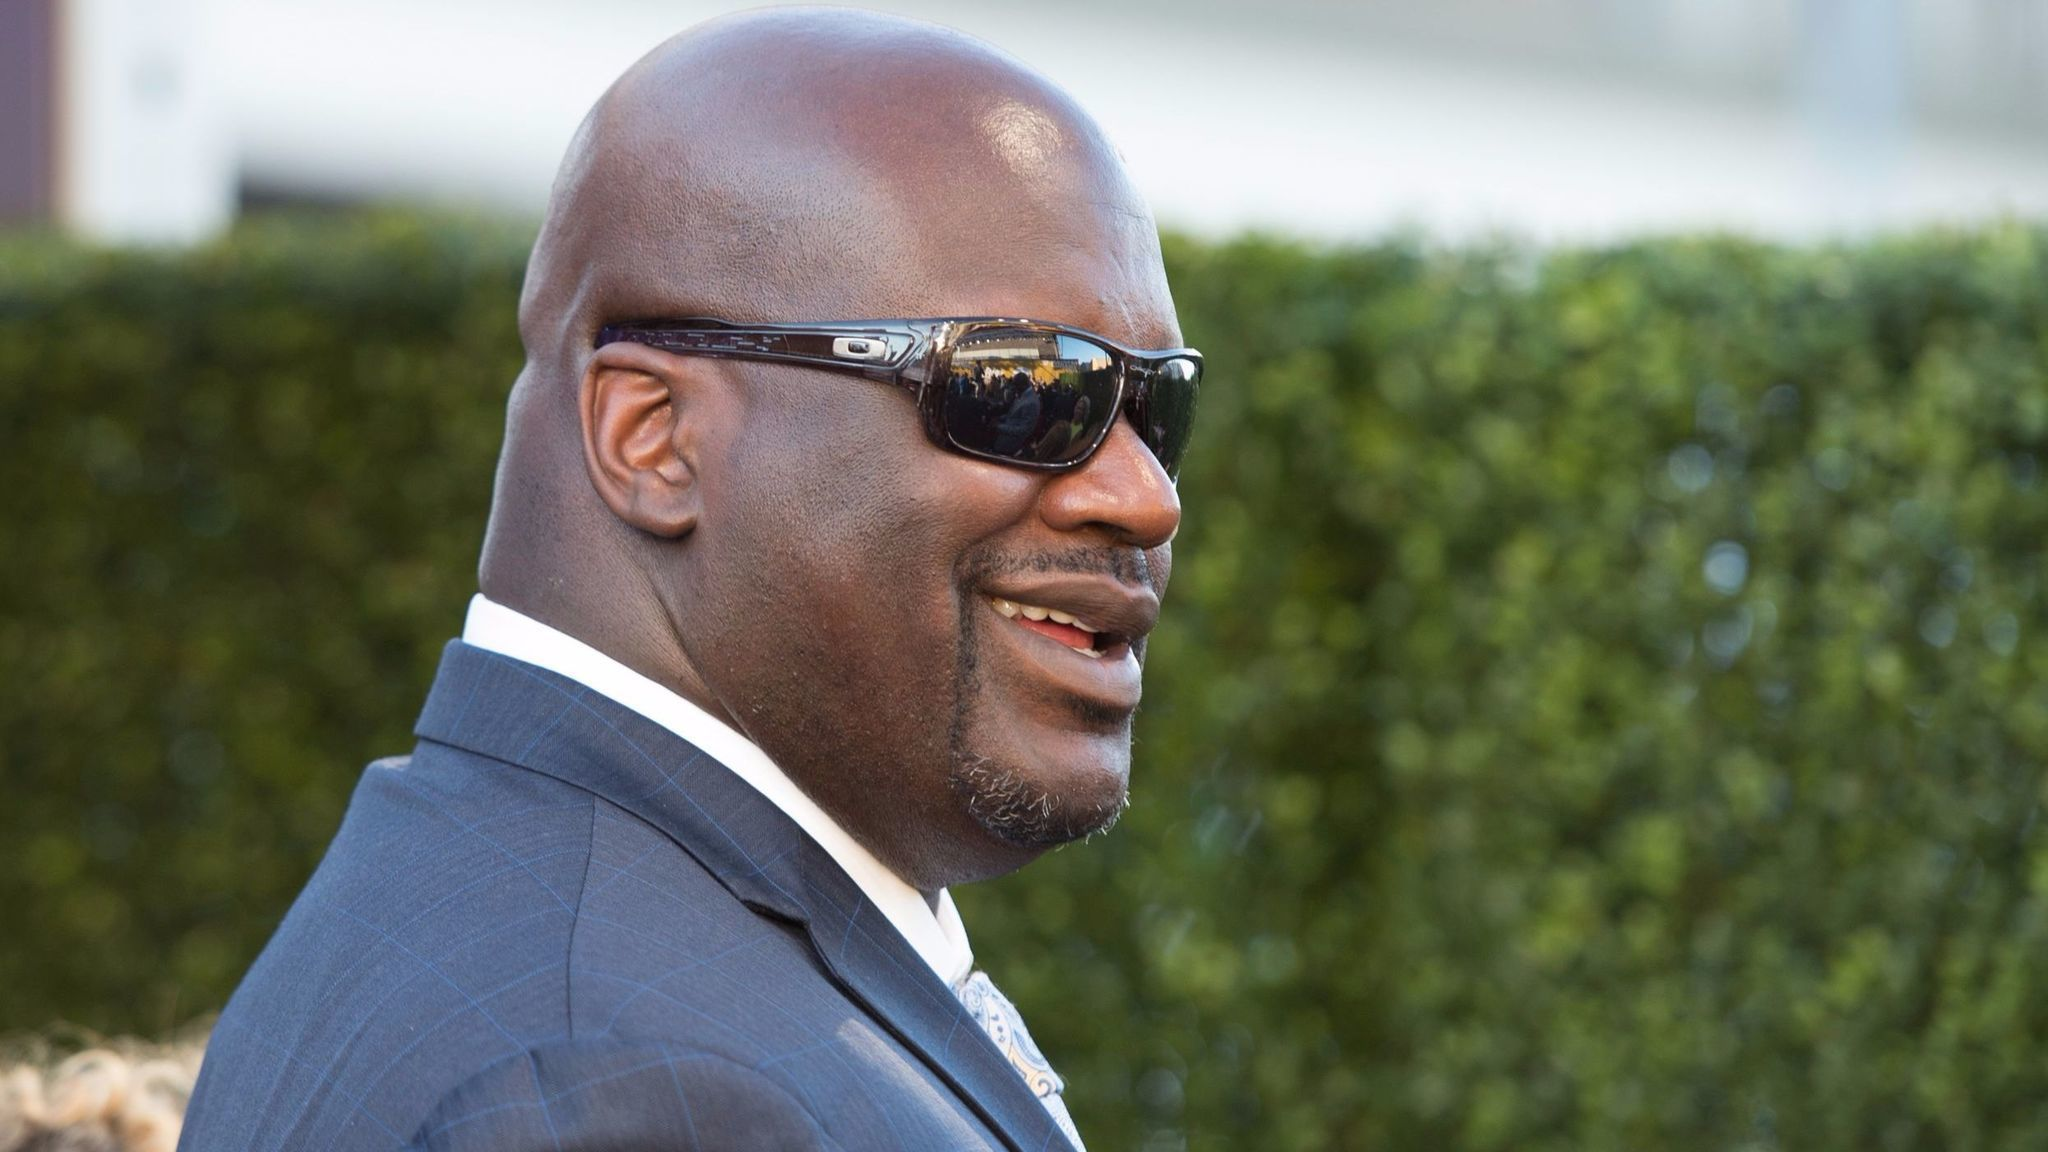 Lonzo Ball Rap Career >> LaVar Ball not impressed by Shaq's diss track - LA Times